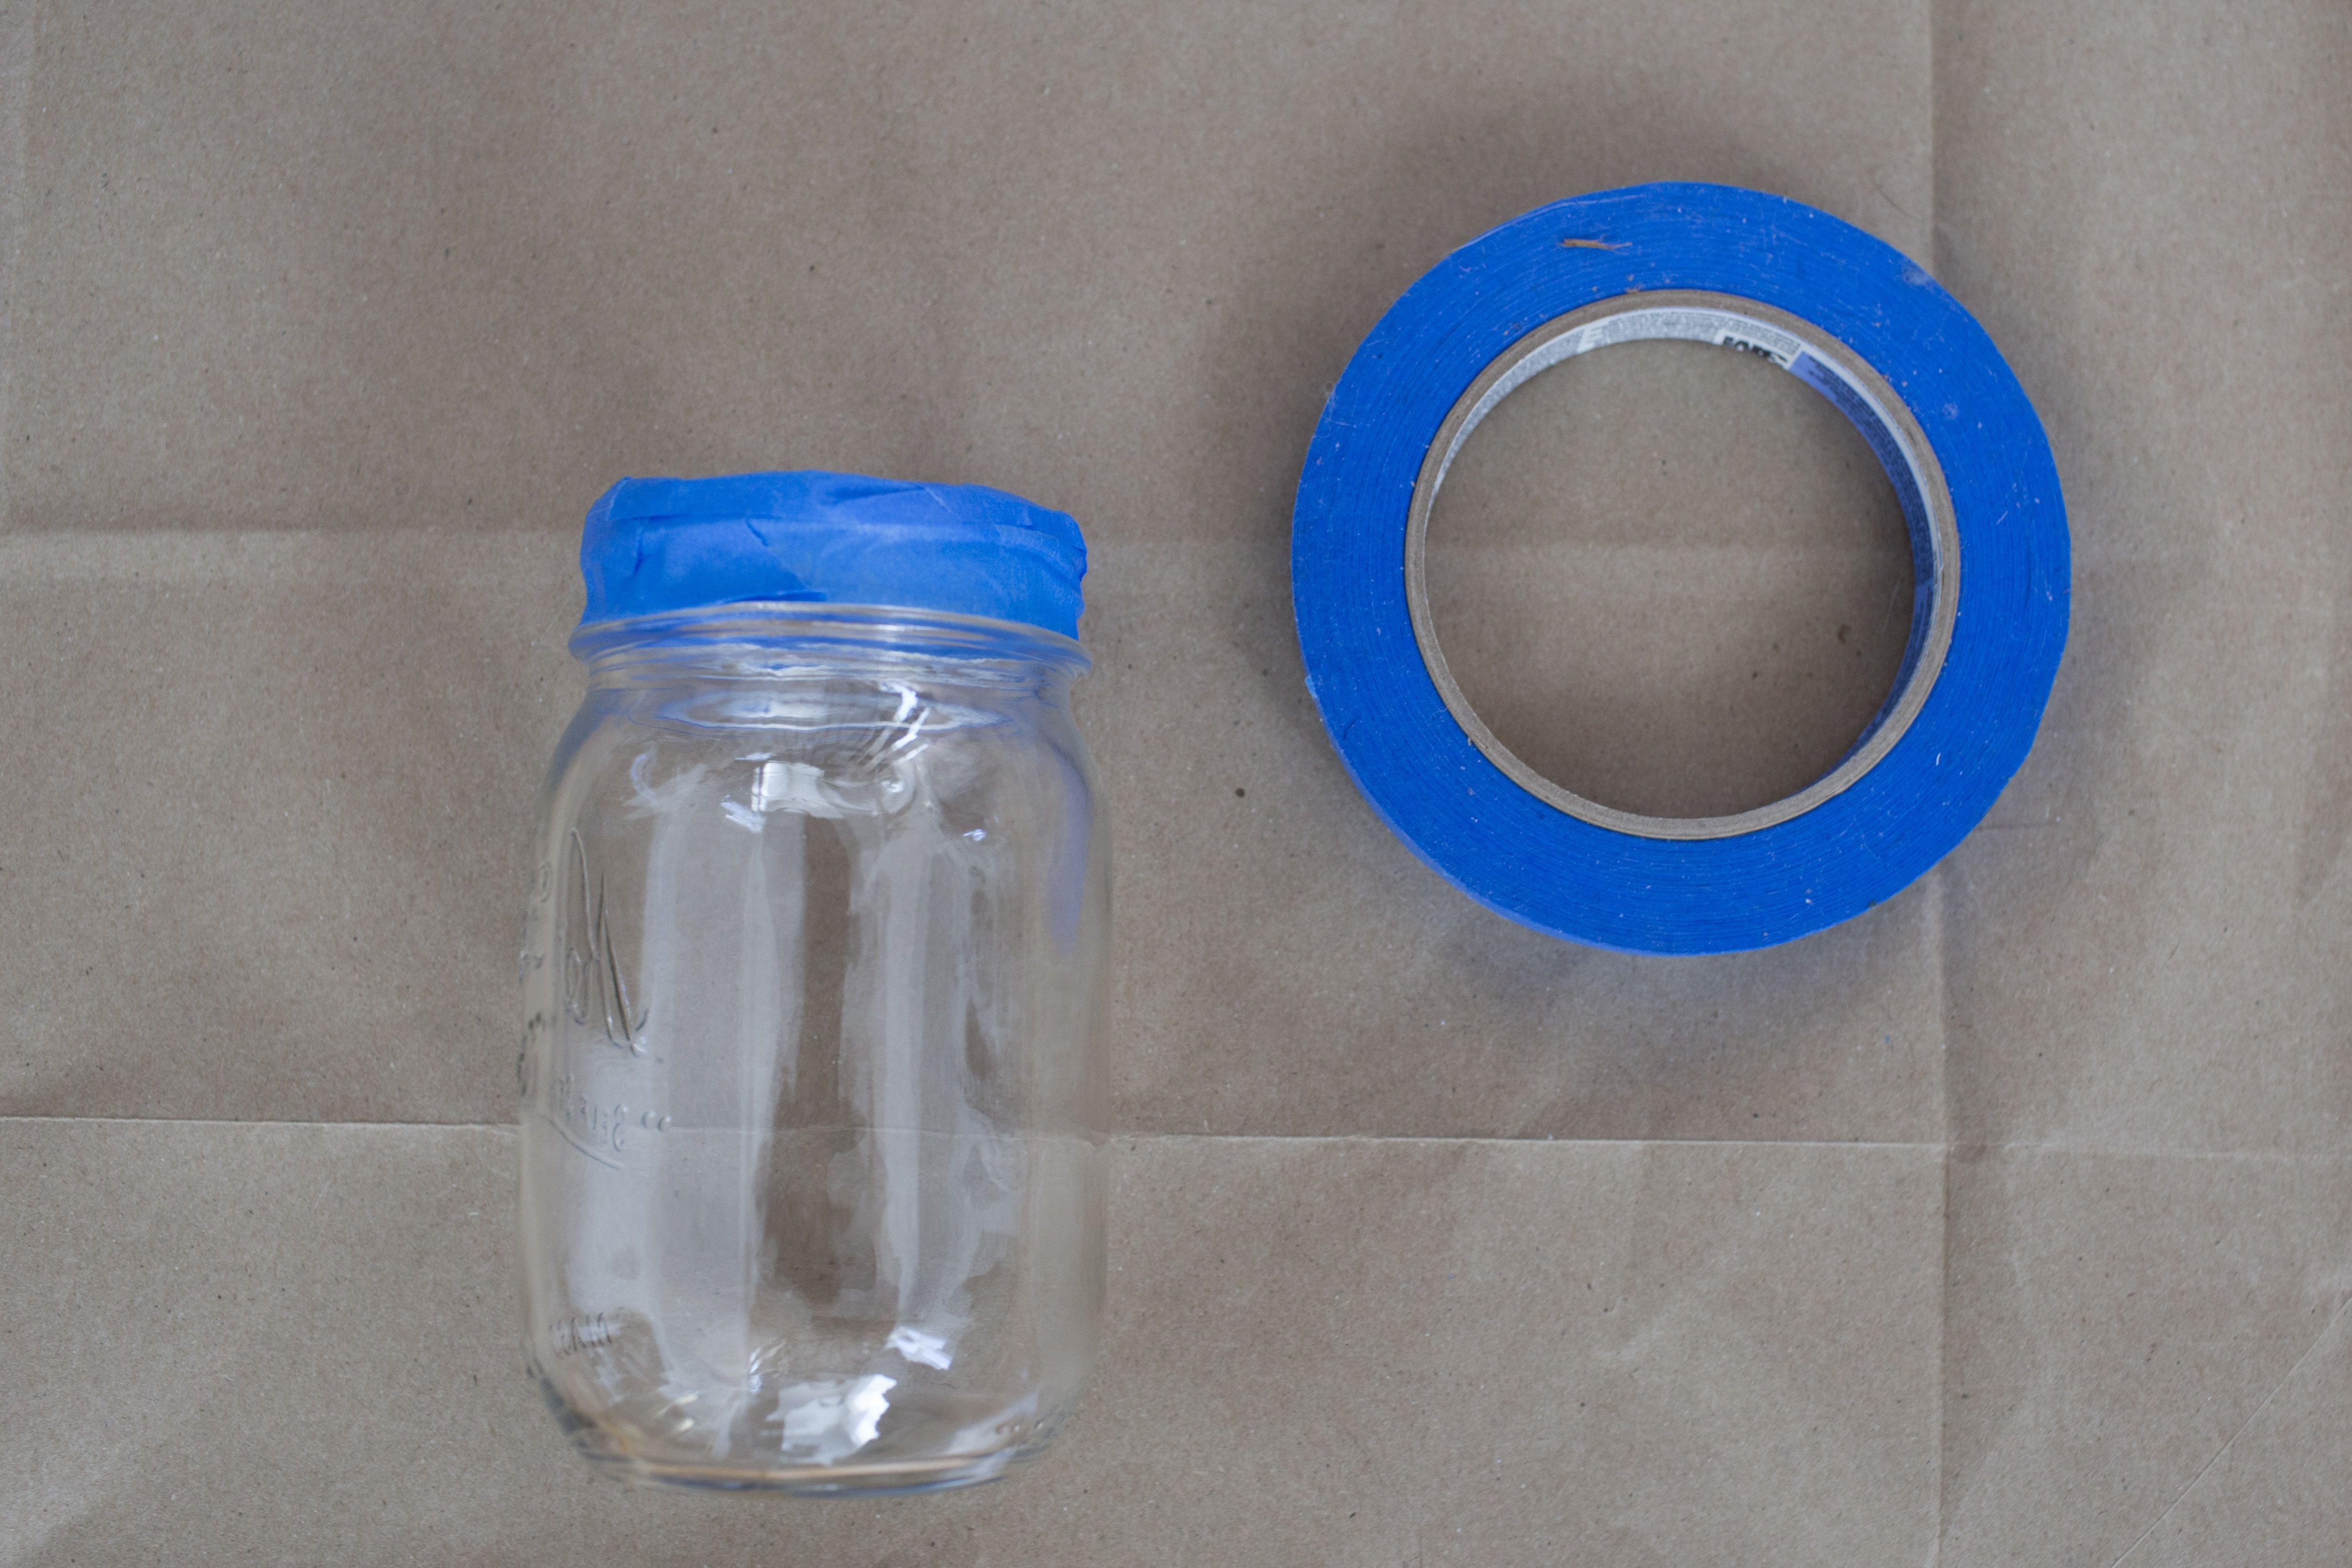 Taped jar